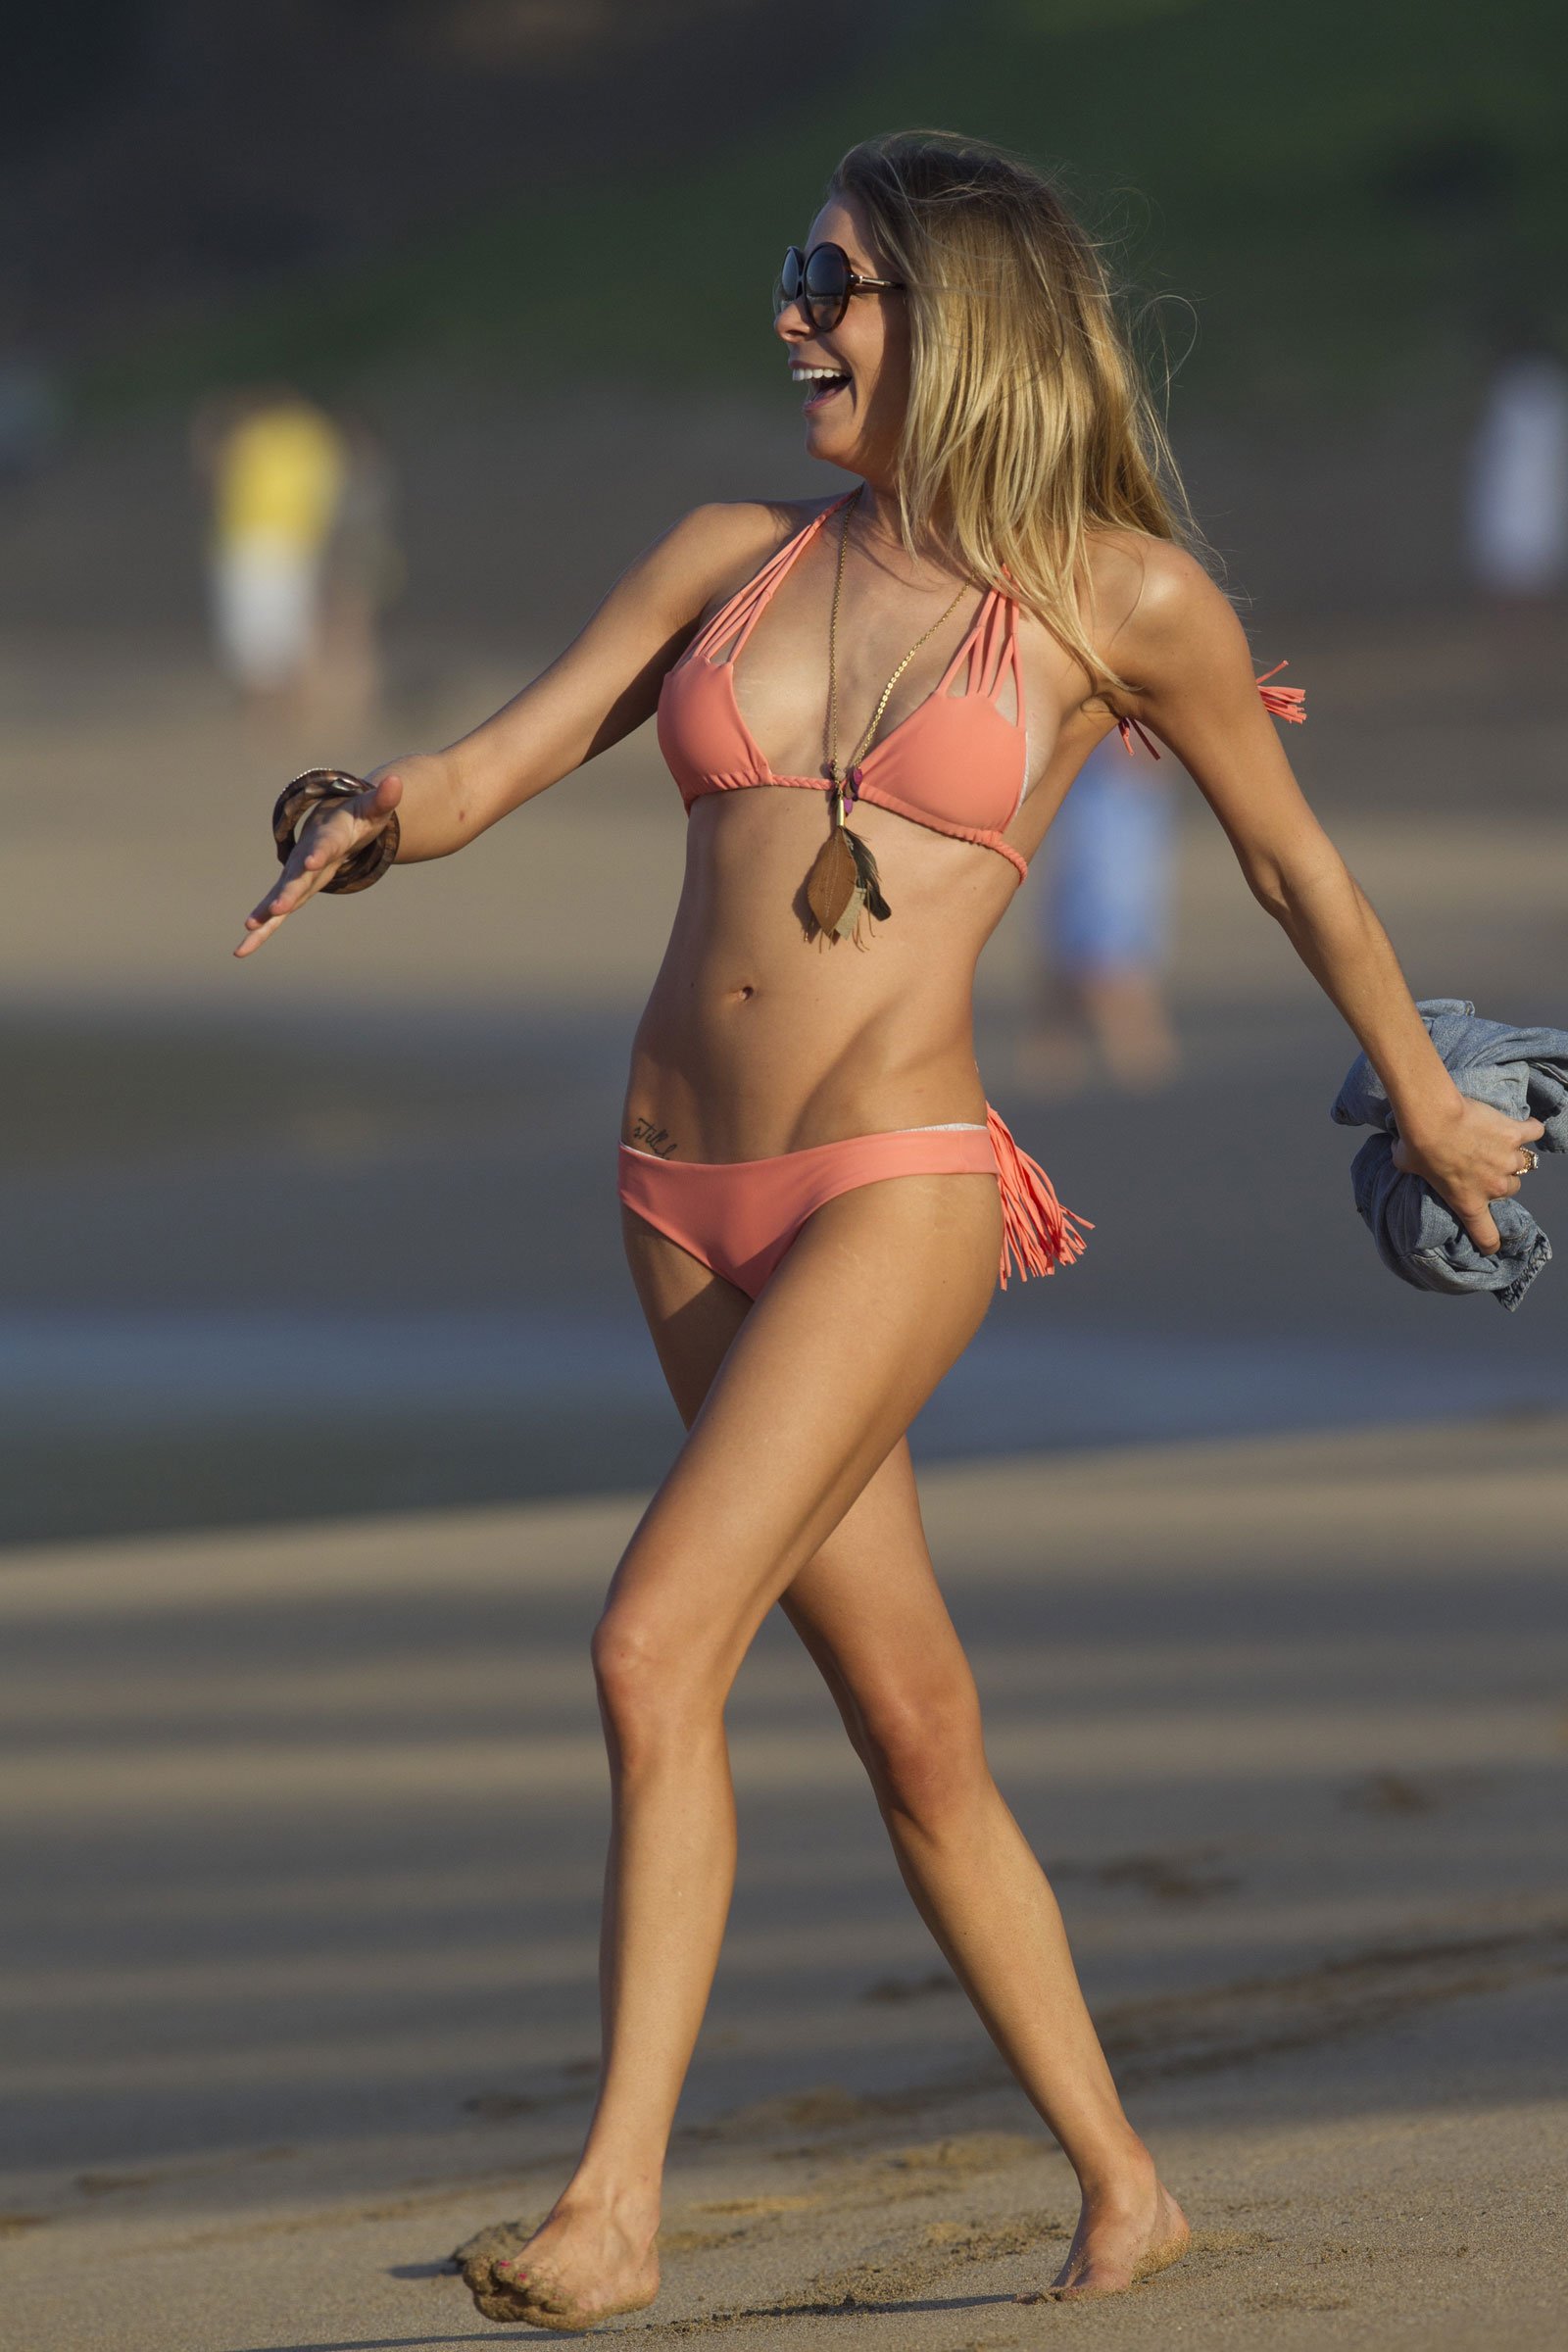 leann-rimes-wearing-a-bikini-naked-skinny-nudist-families